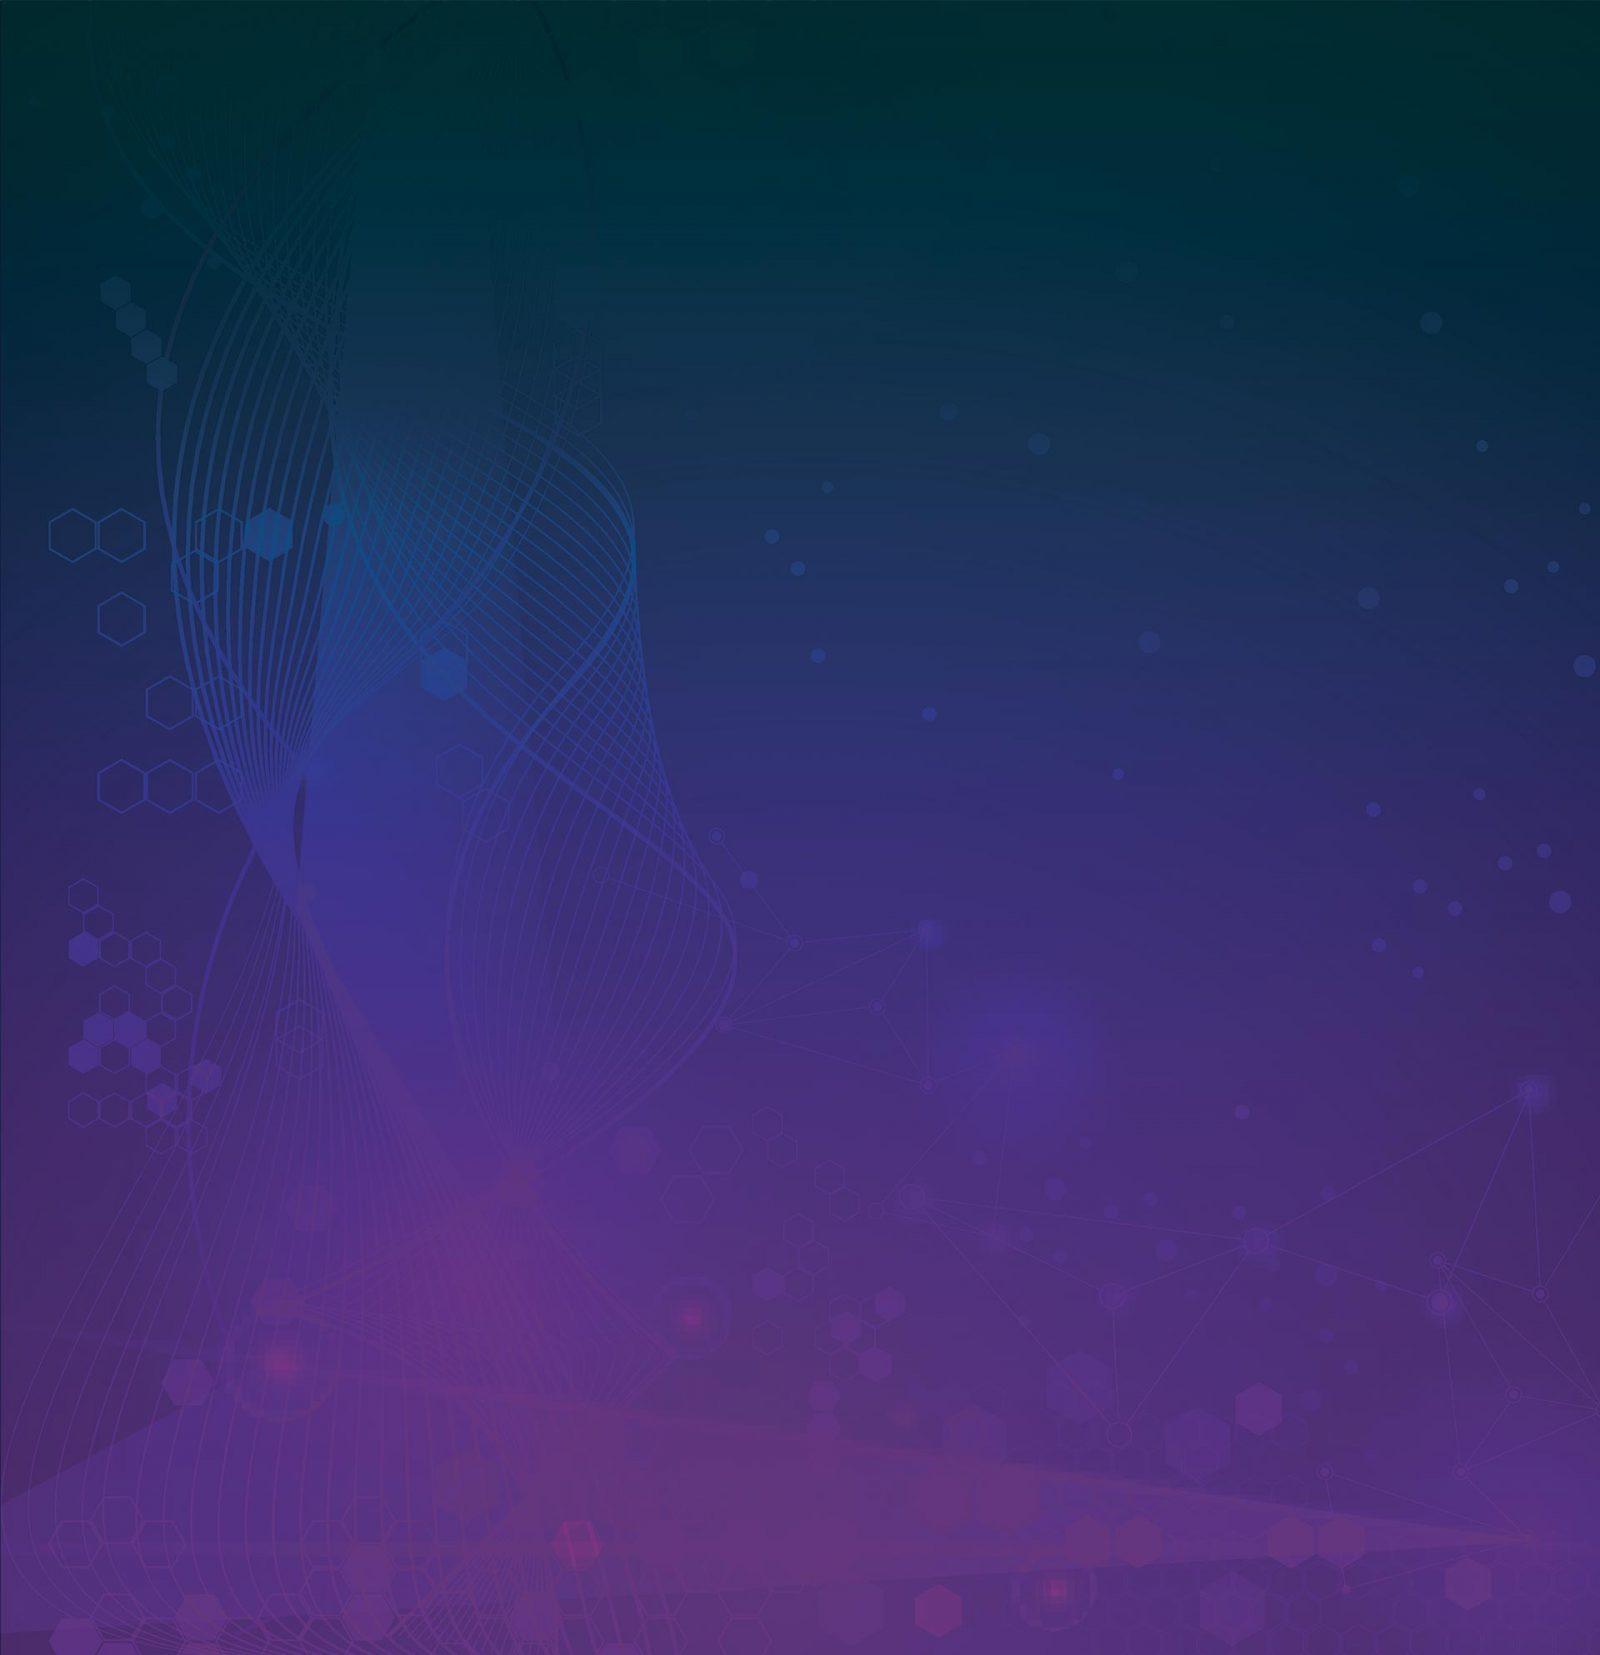 Ascensus Background